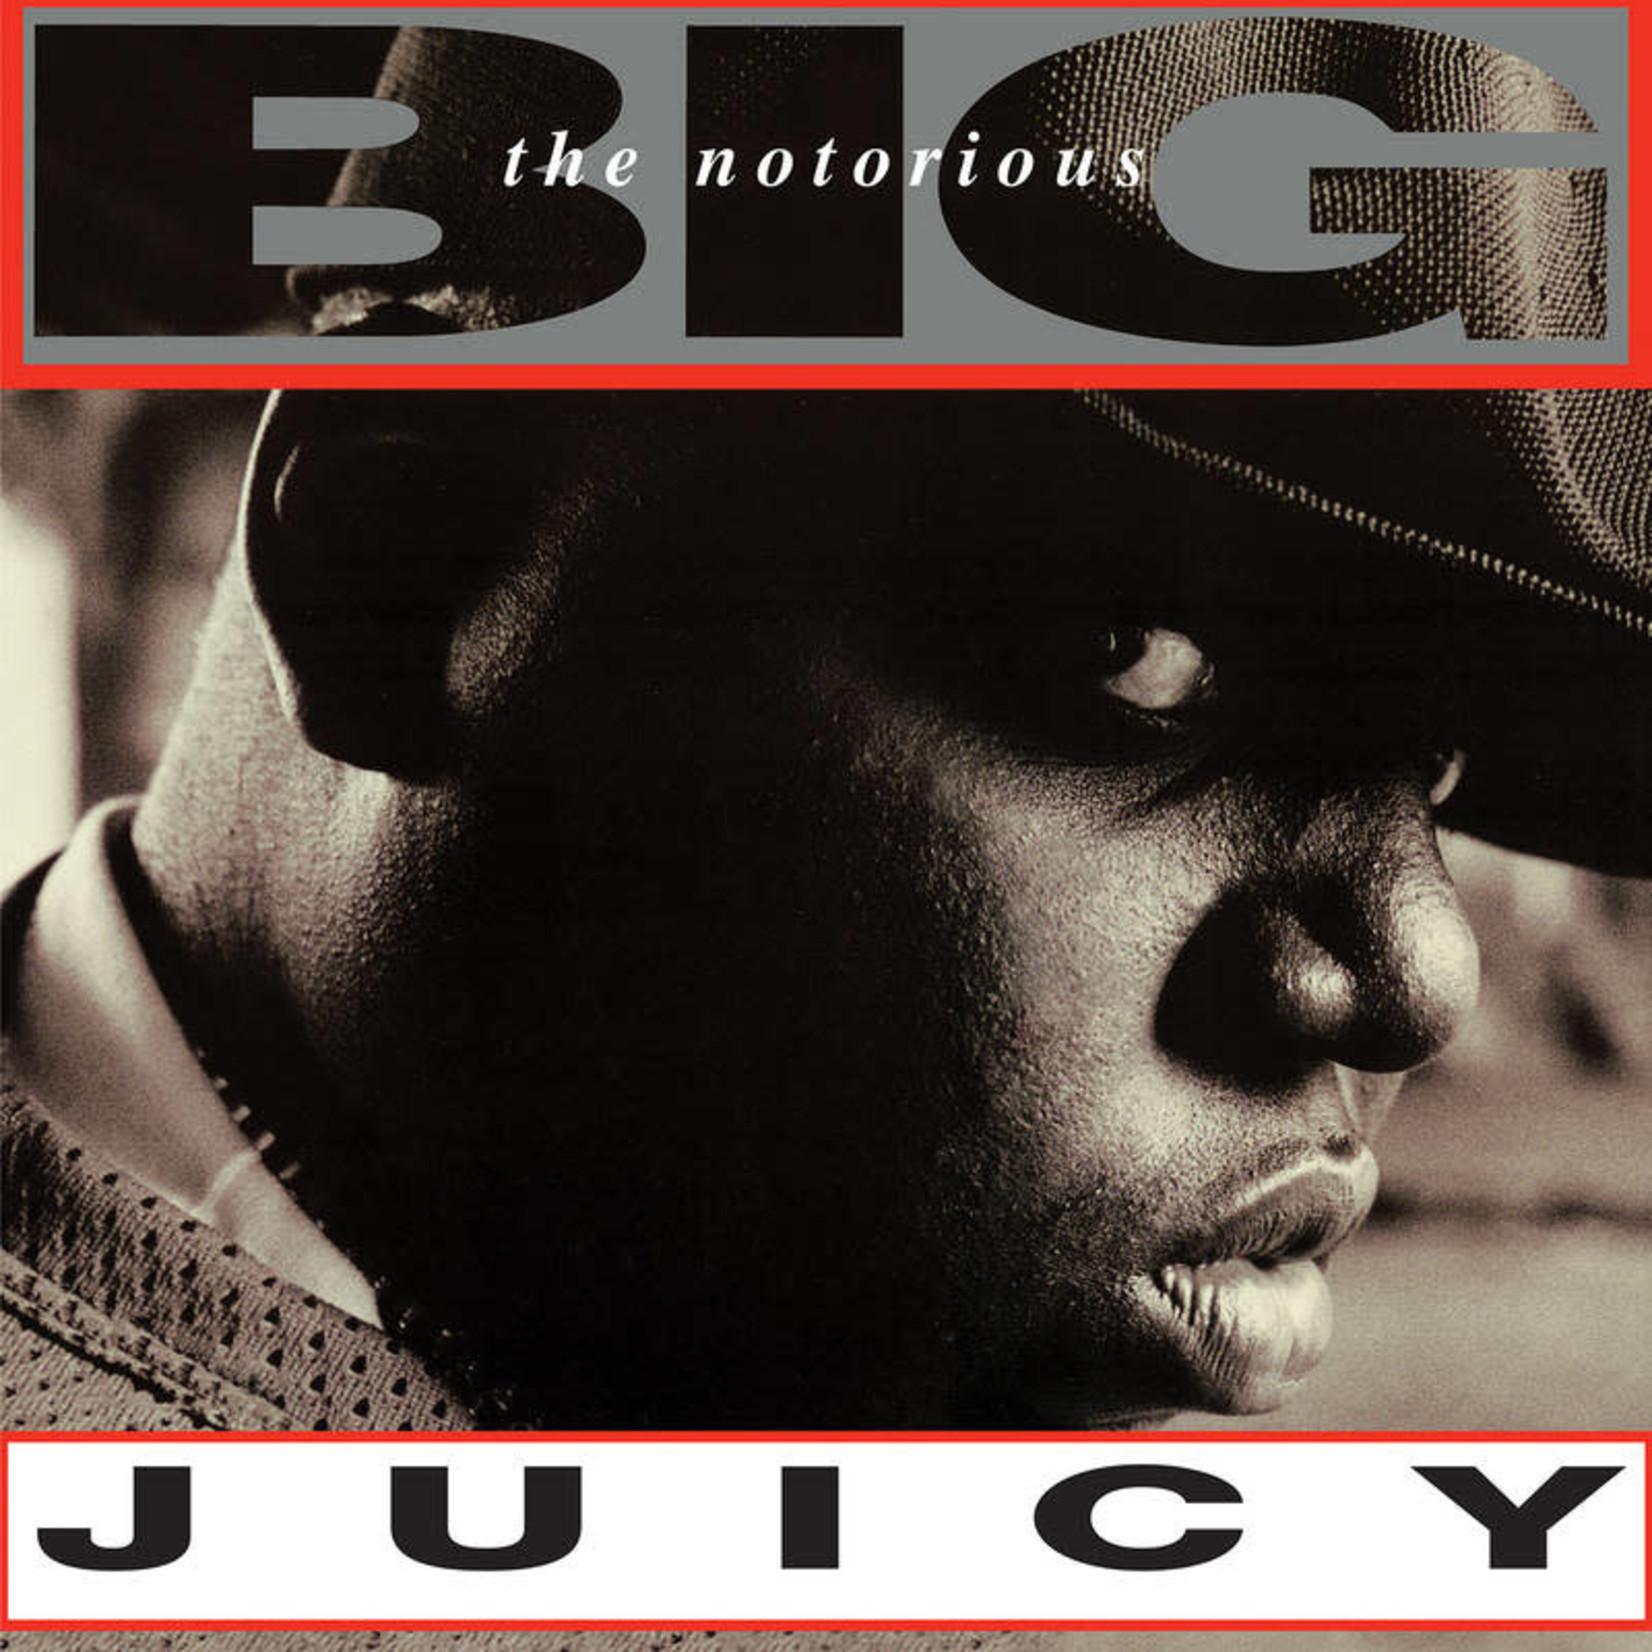 [New] Notorious B.I.G.: Juicy (12'')